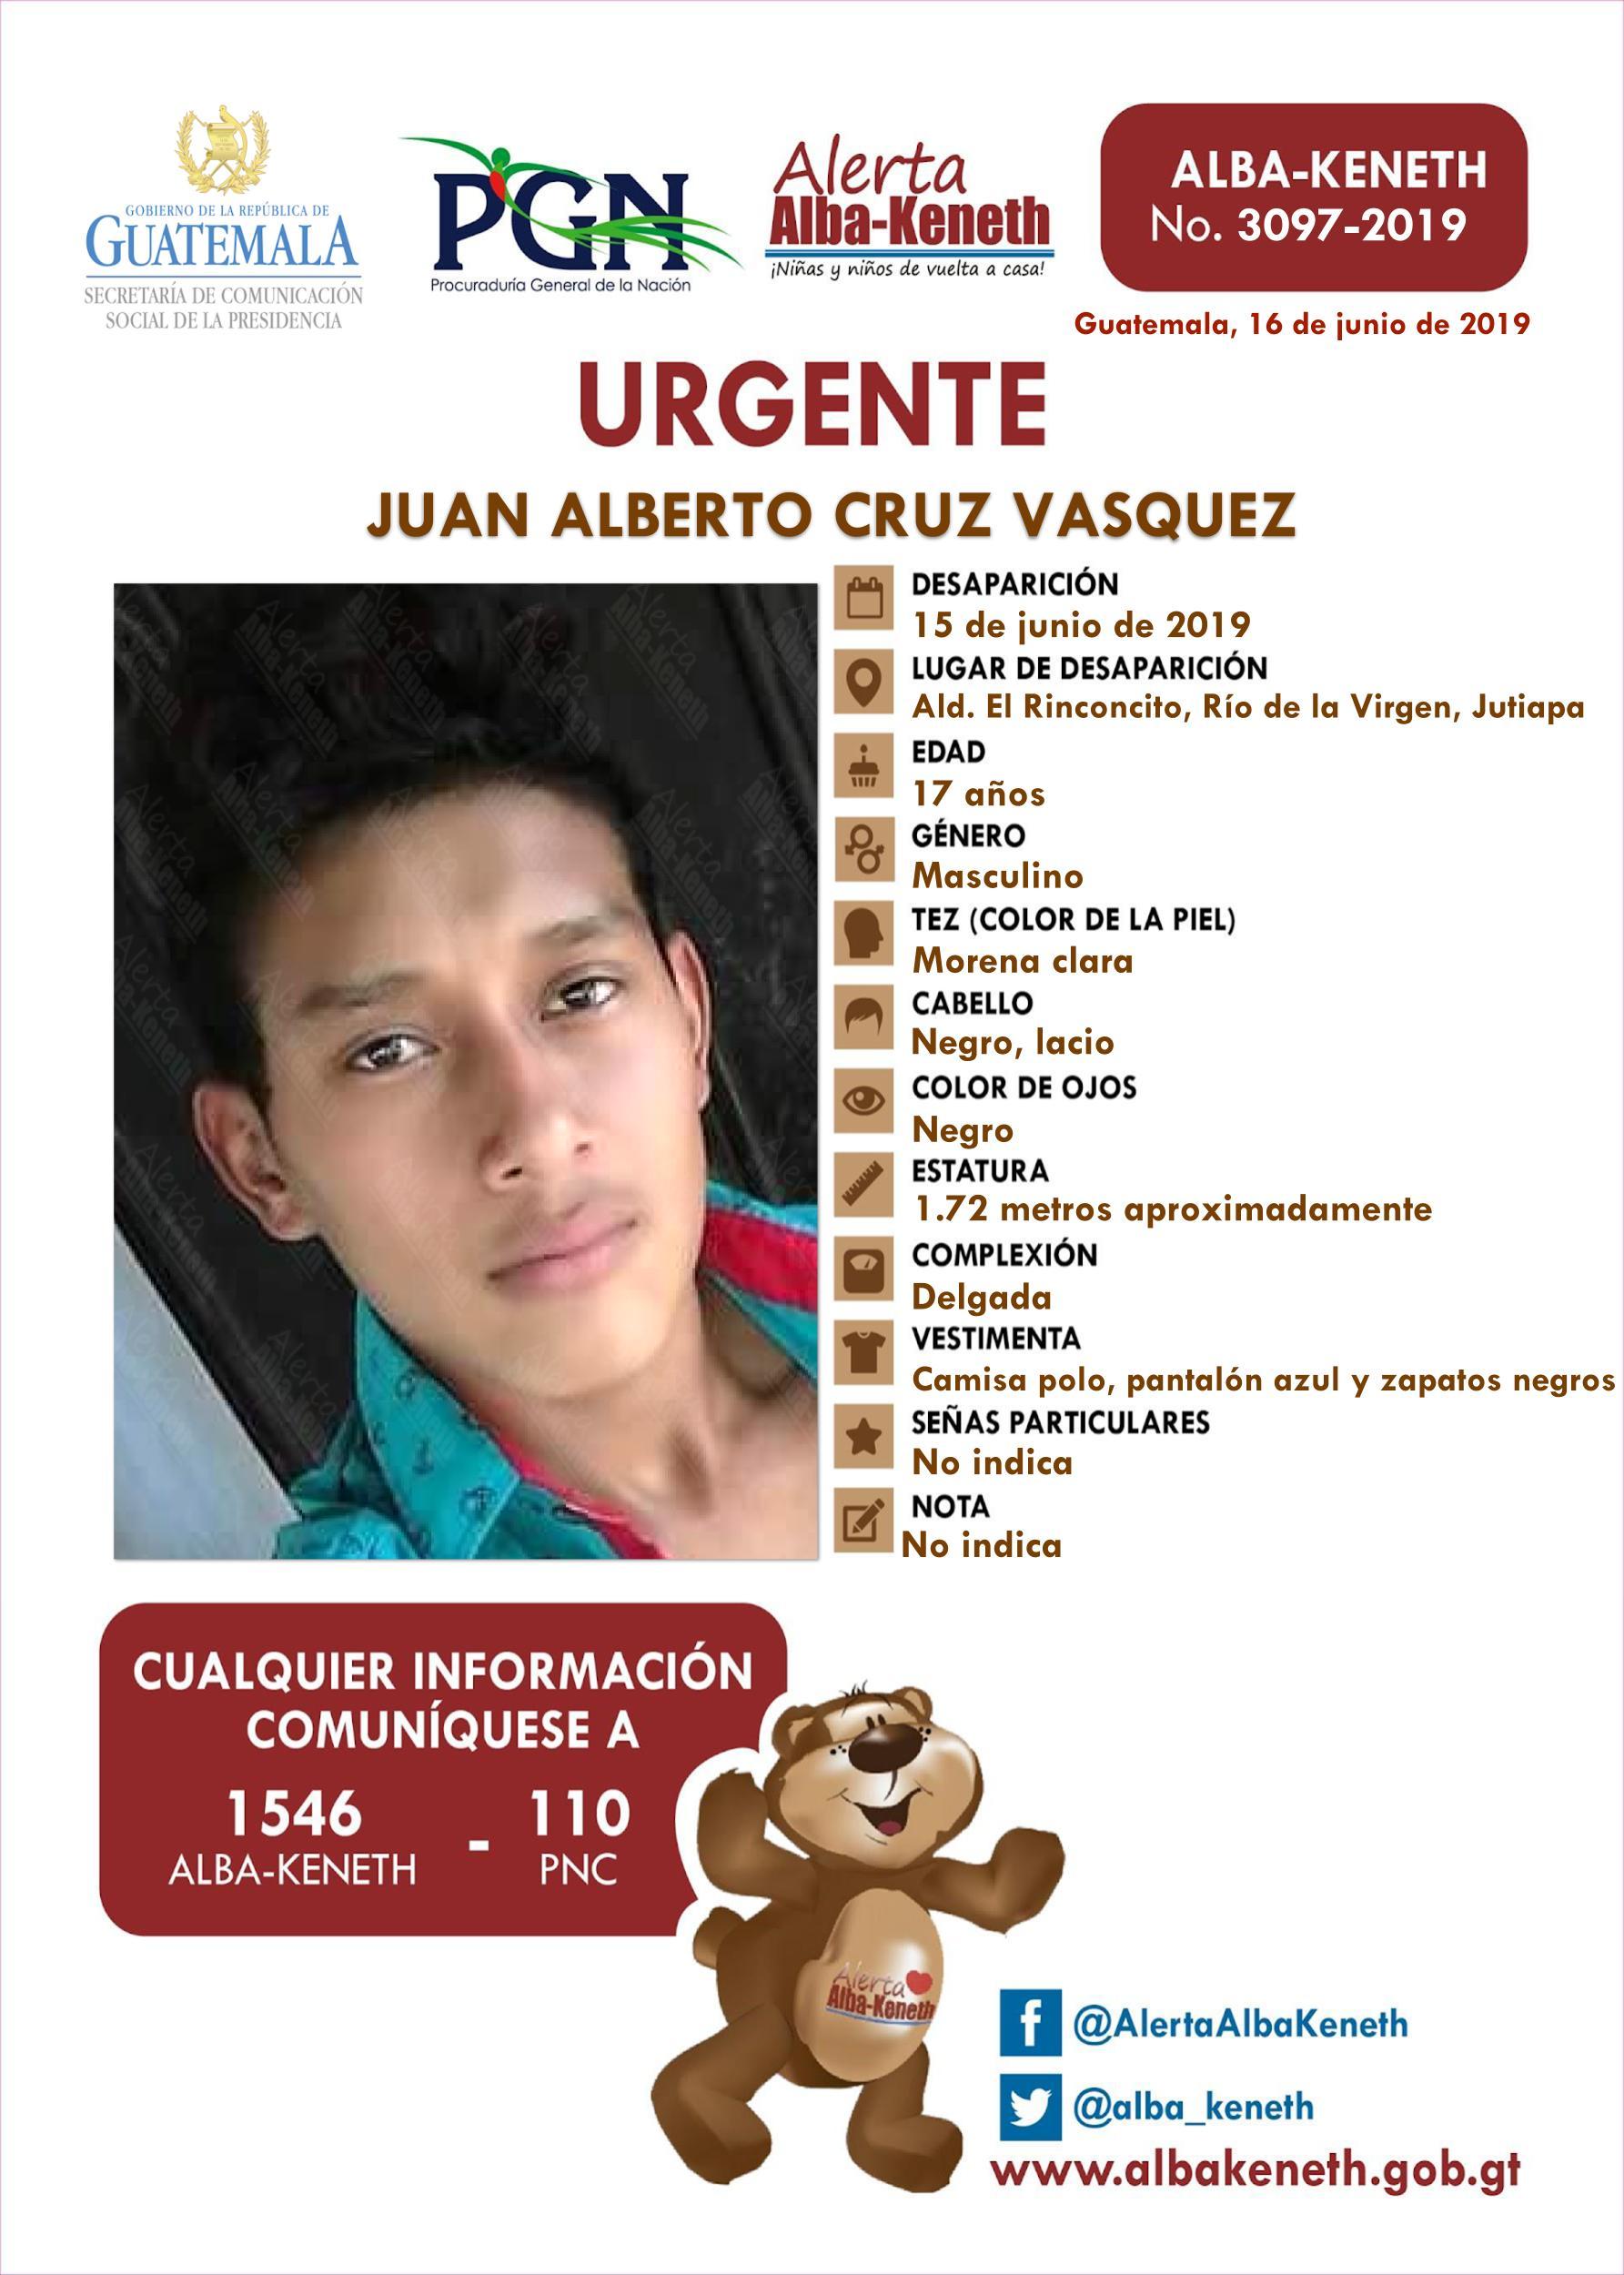 Juan Alberto Cruz Vasquez